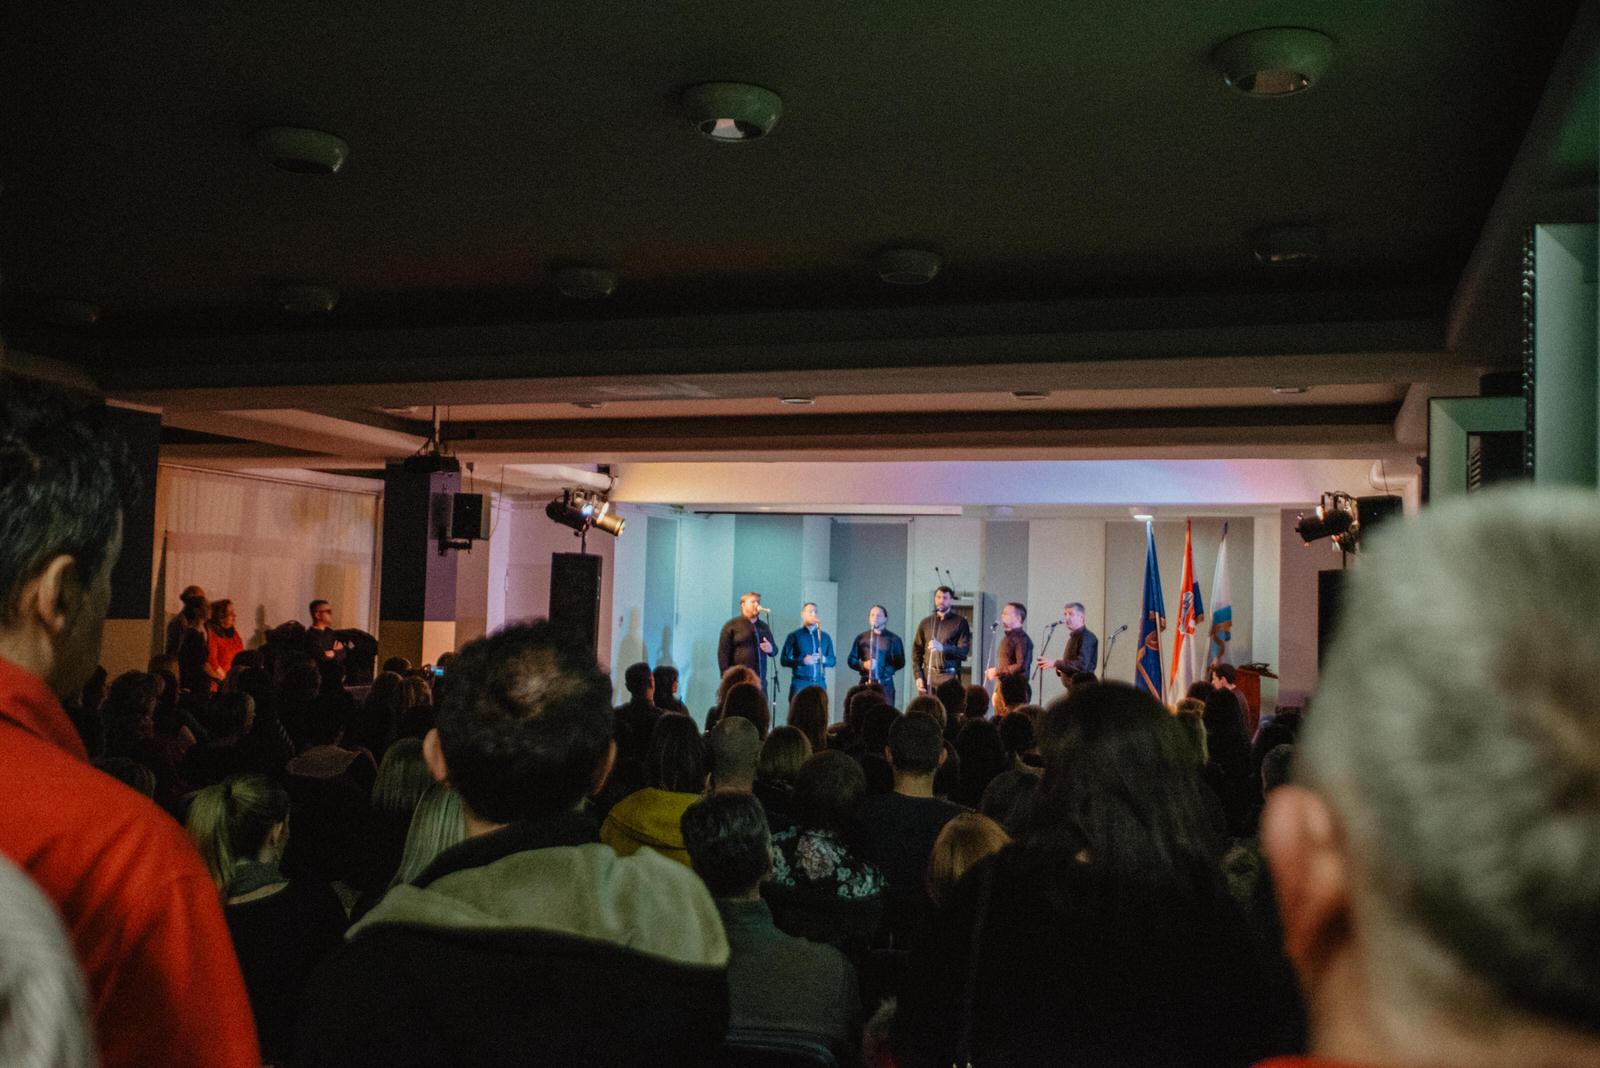 likaclub_koncert-klapa-cambi_kic-gospić_2019-22